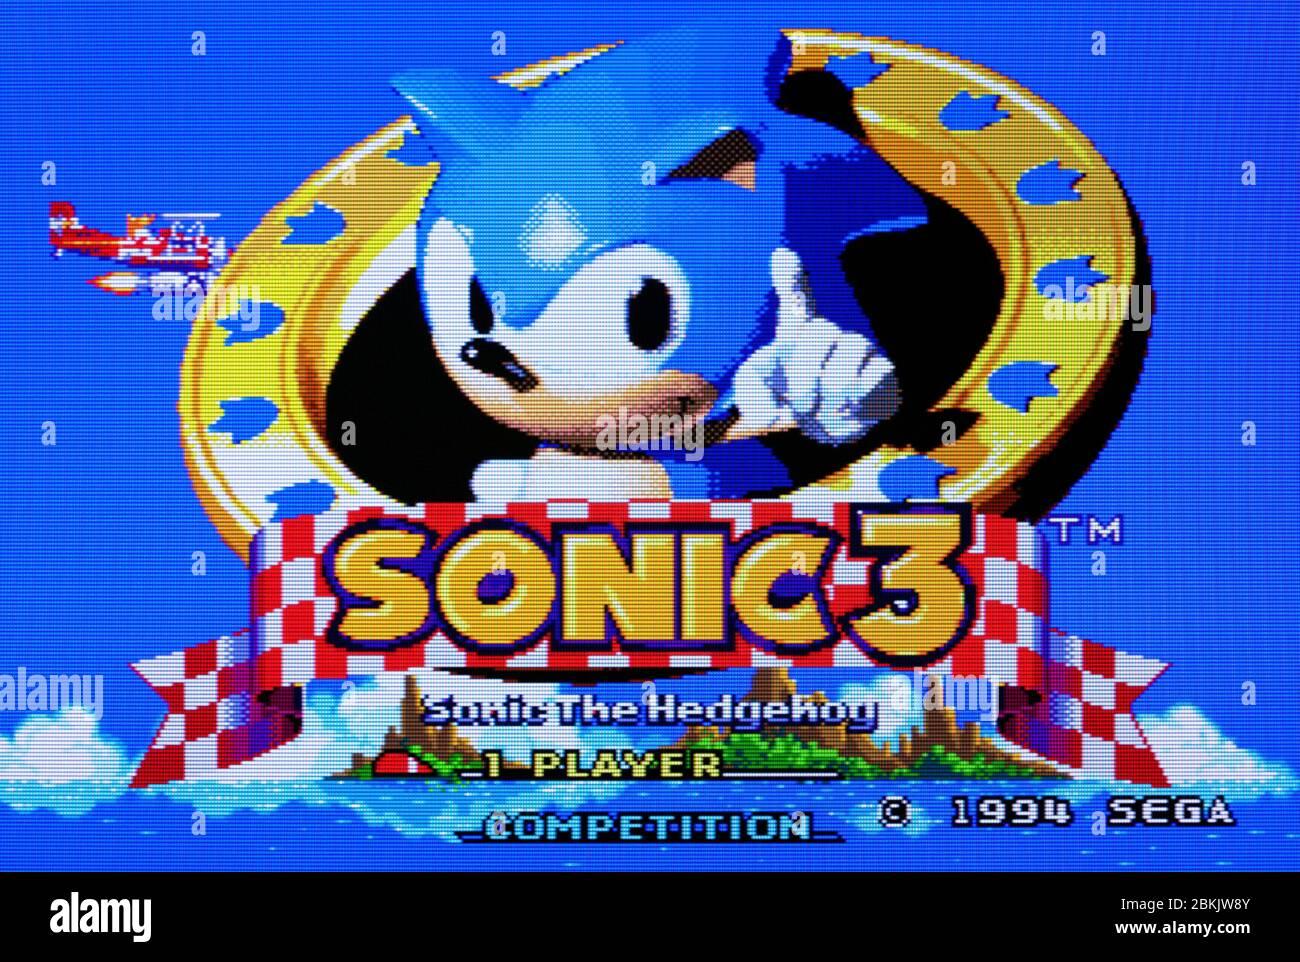 Sonic The Hedgehog 3 Sega Genesis Mega Drive Editorial Use Only Stock Photo Alamy